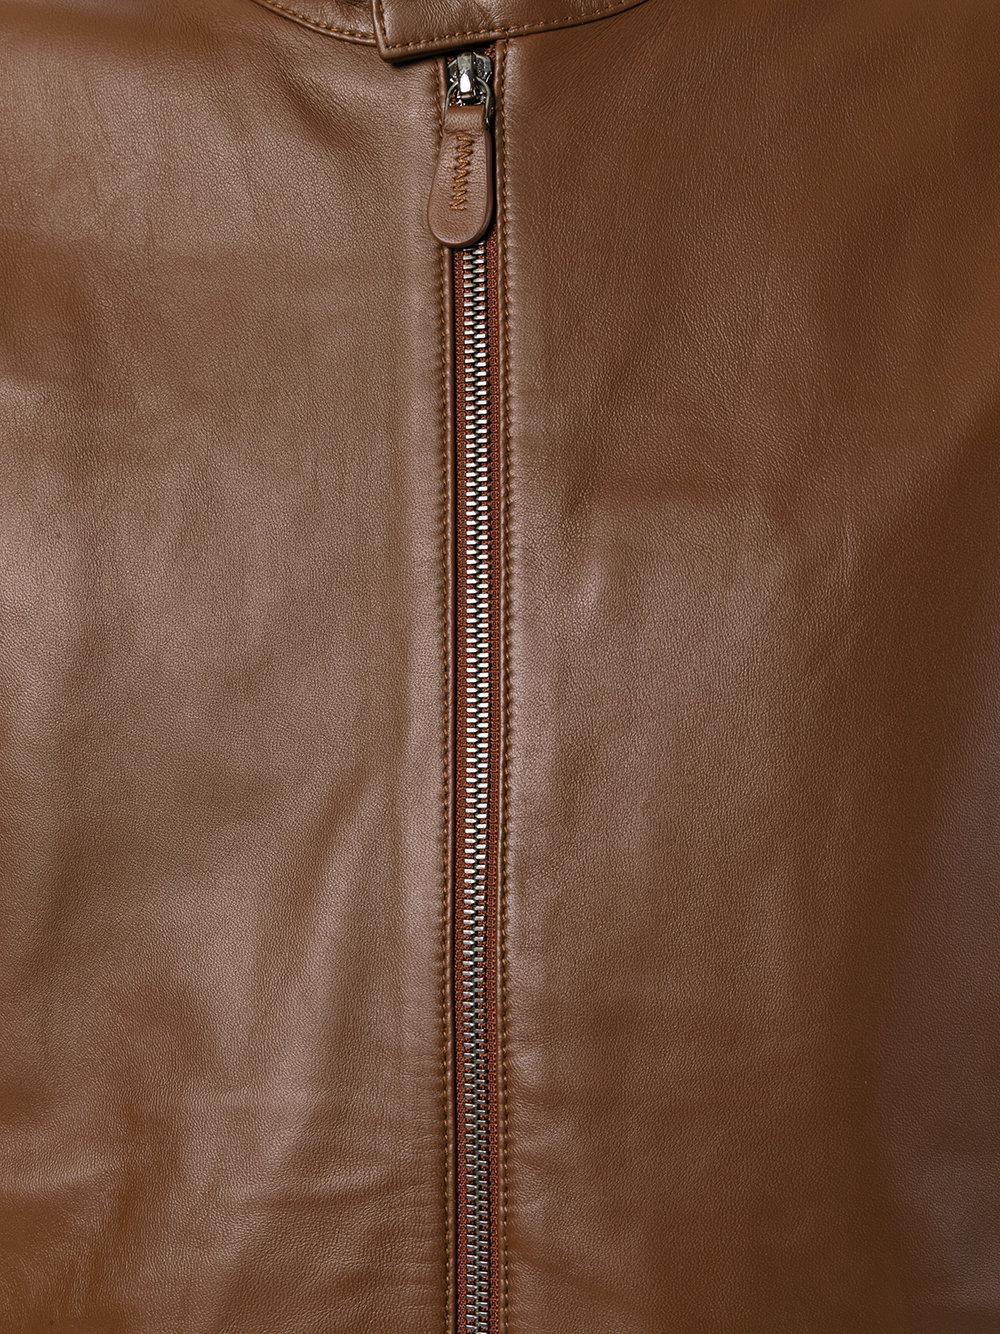 z-zegna-Brown-Bomber-style-Jacket (4).jpeg